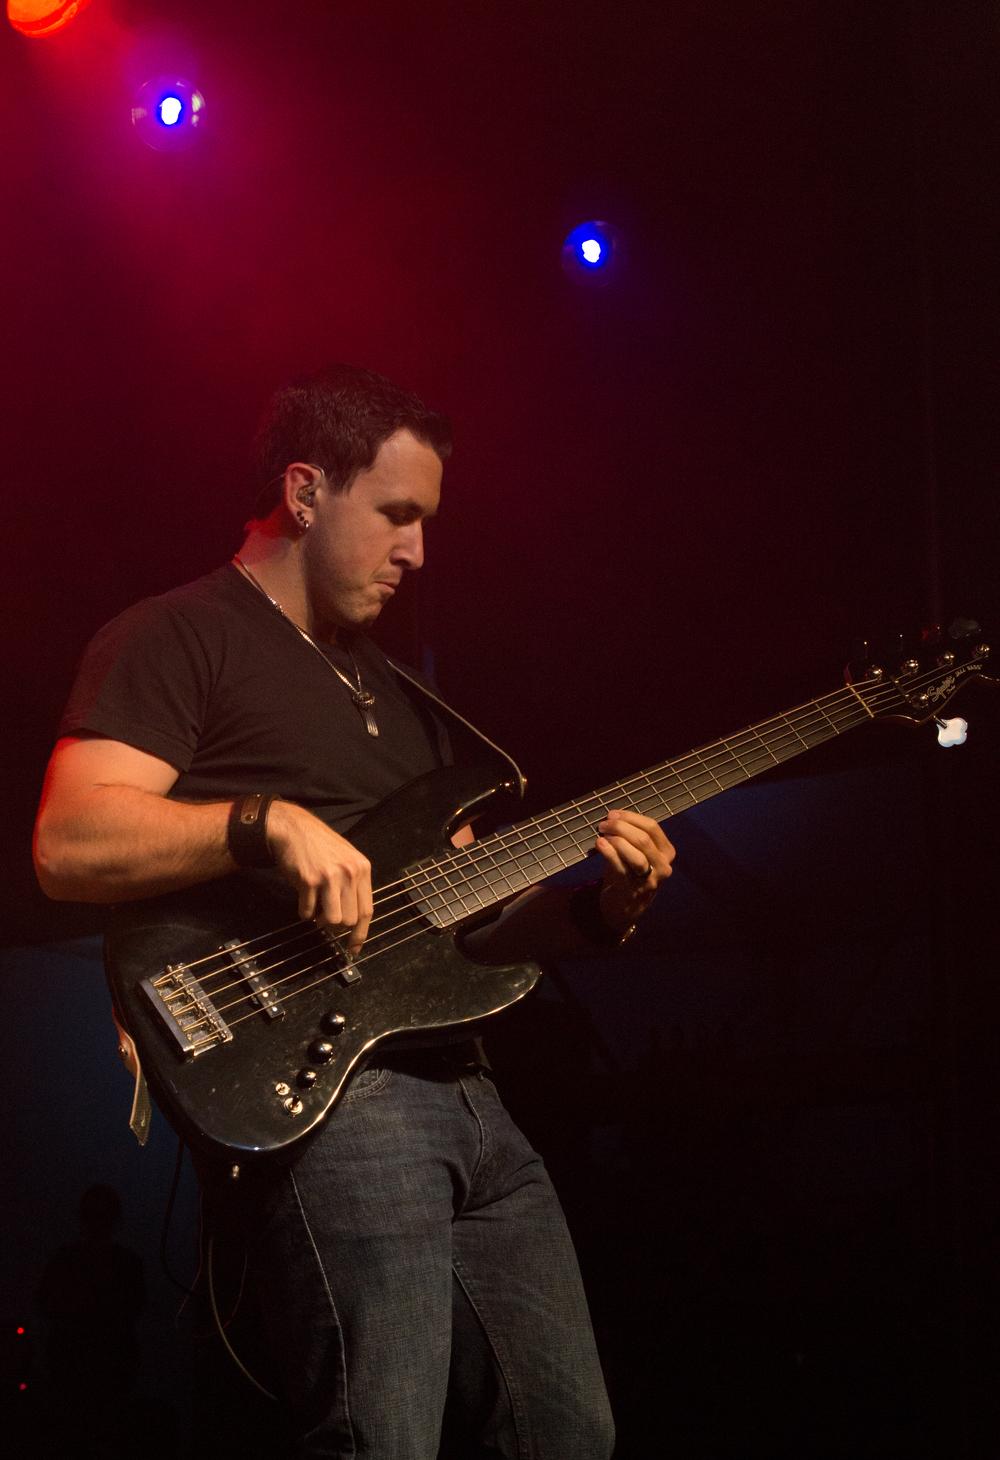 """Very solid musician/ bass guitar player."""